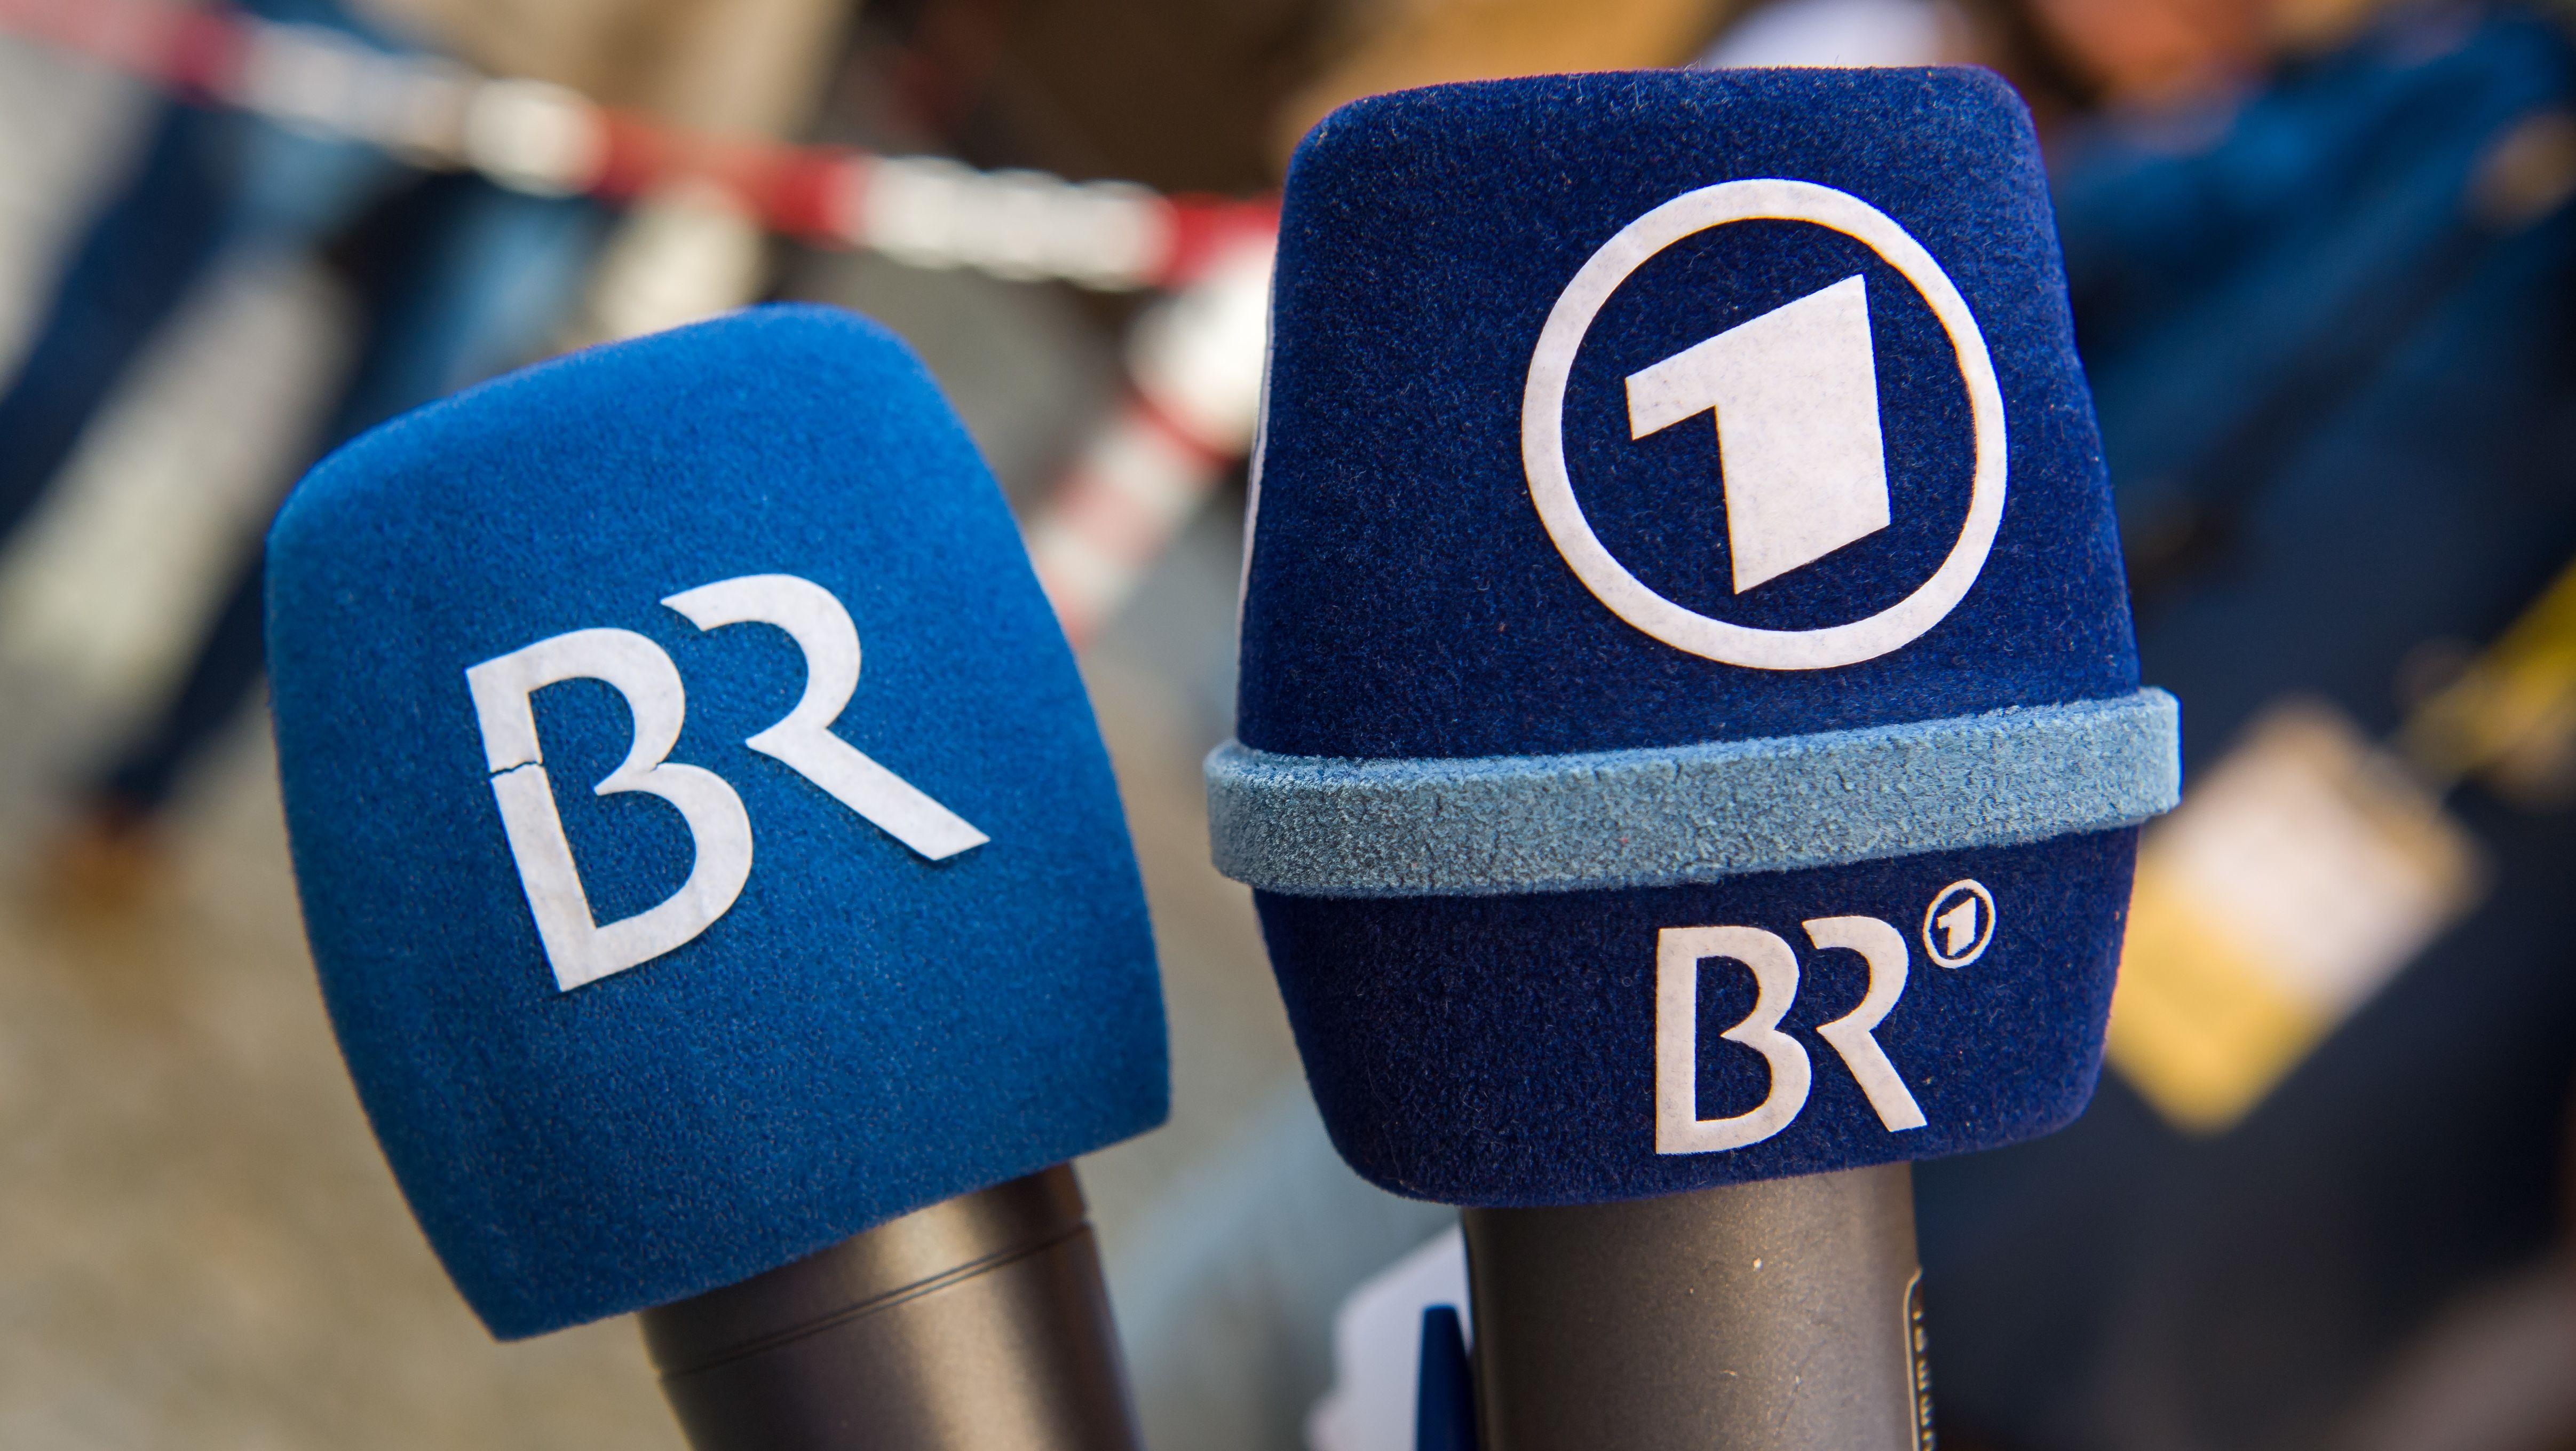 BR- und ARD-Mikrofon (Symbolbild)